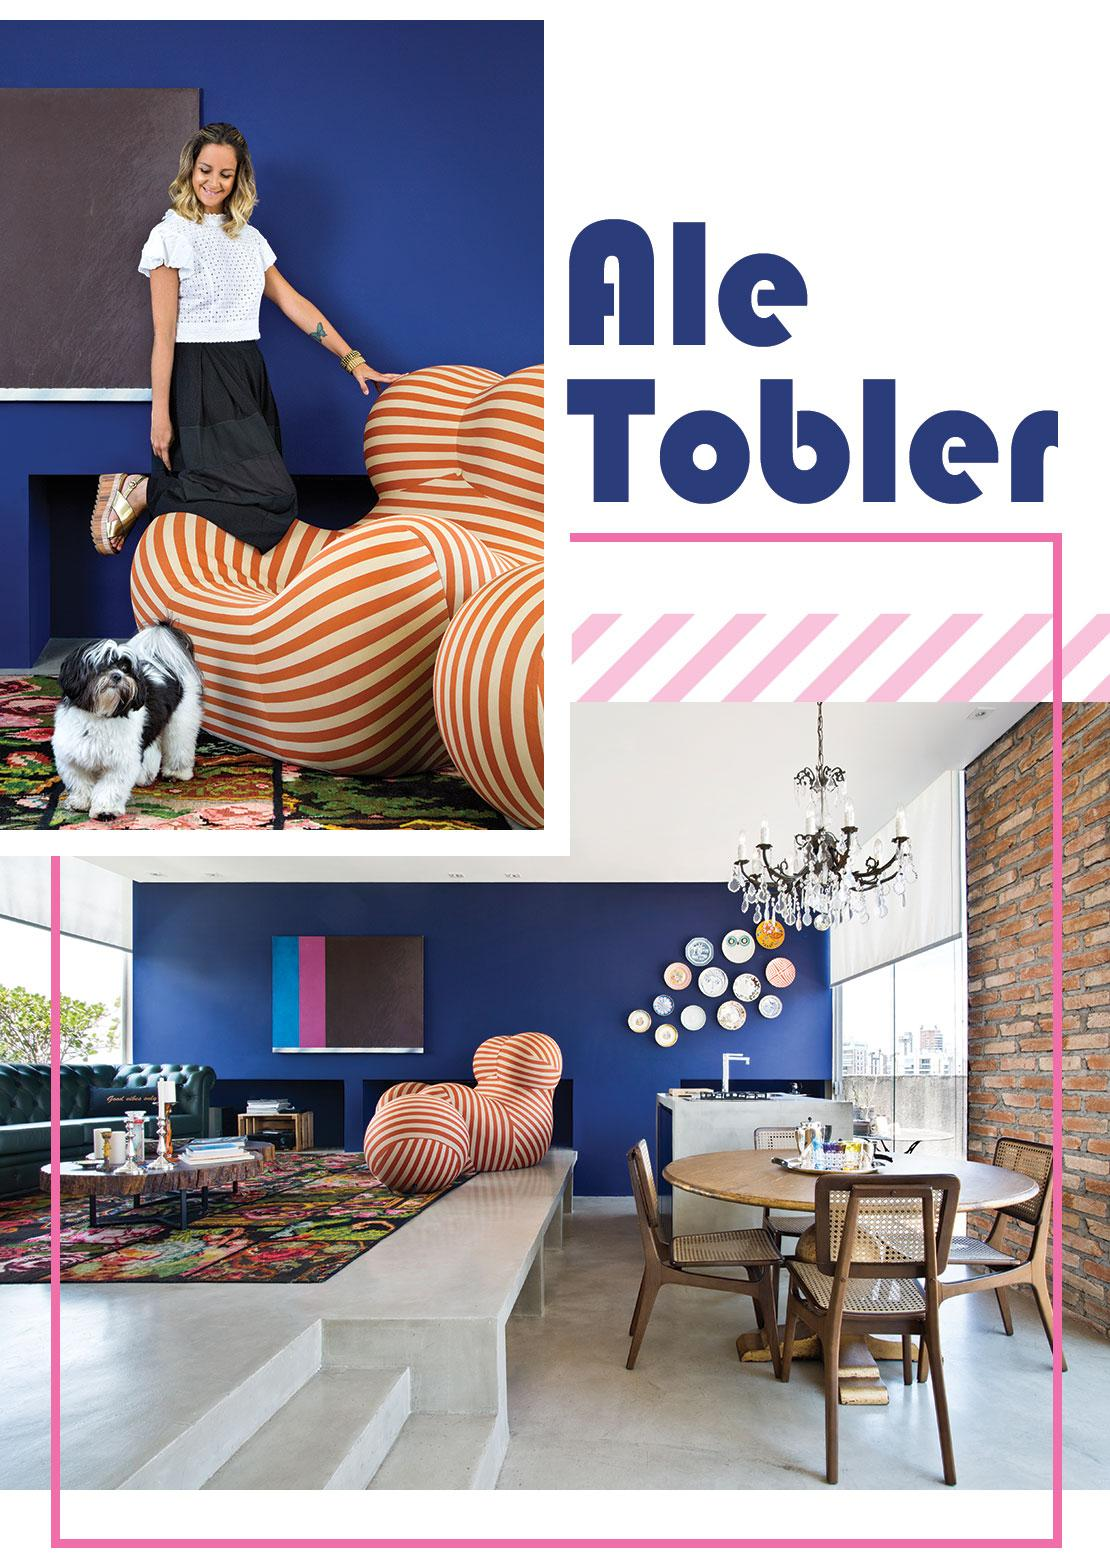 Ale-Tobler-Westwing-Homestory-Wohnzimmer